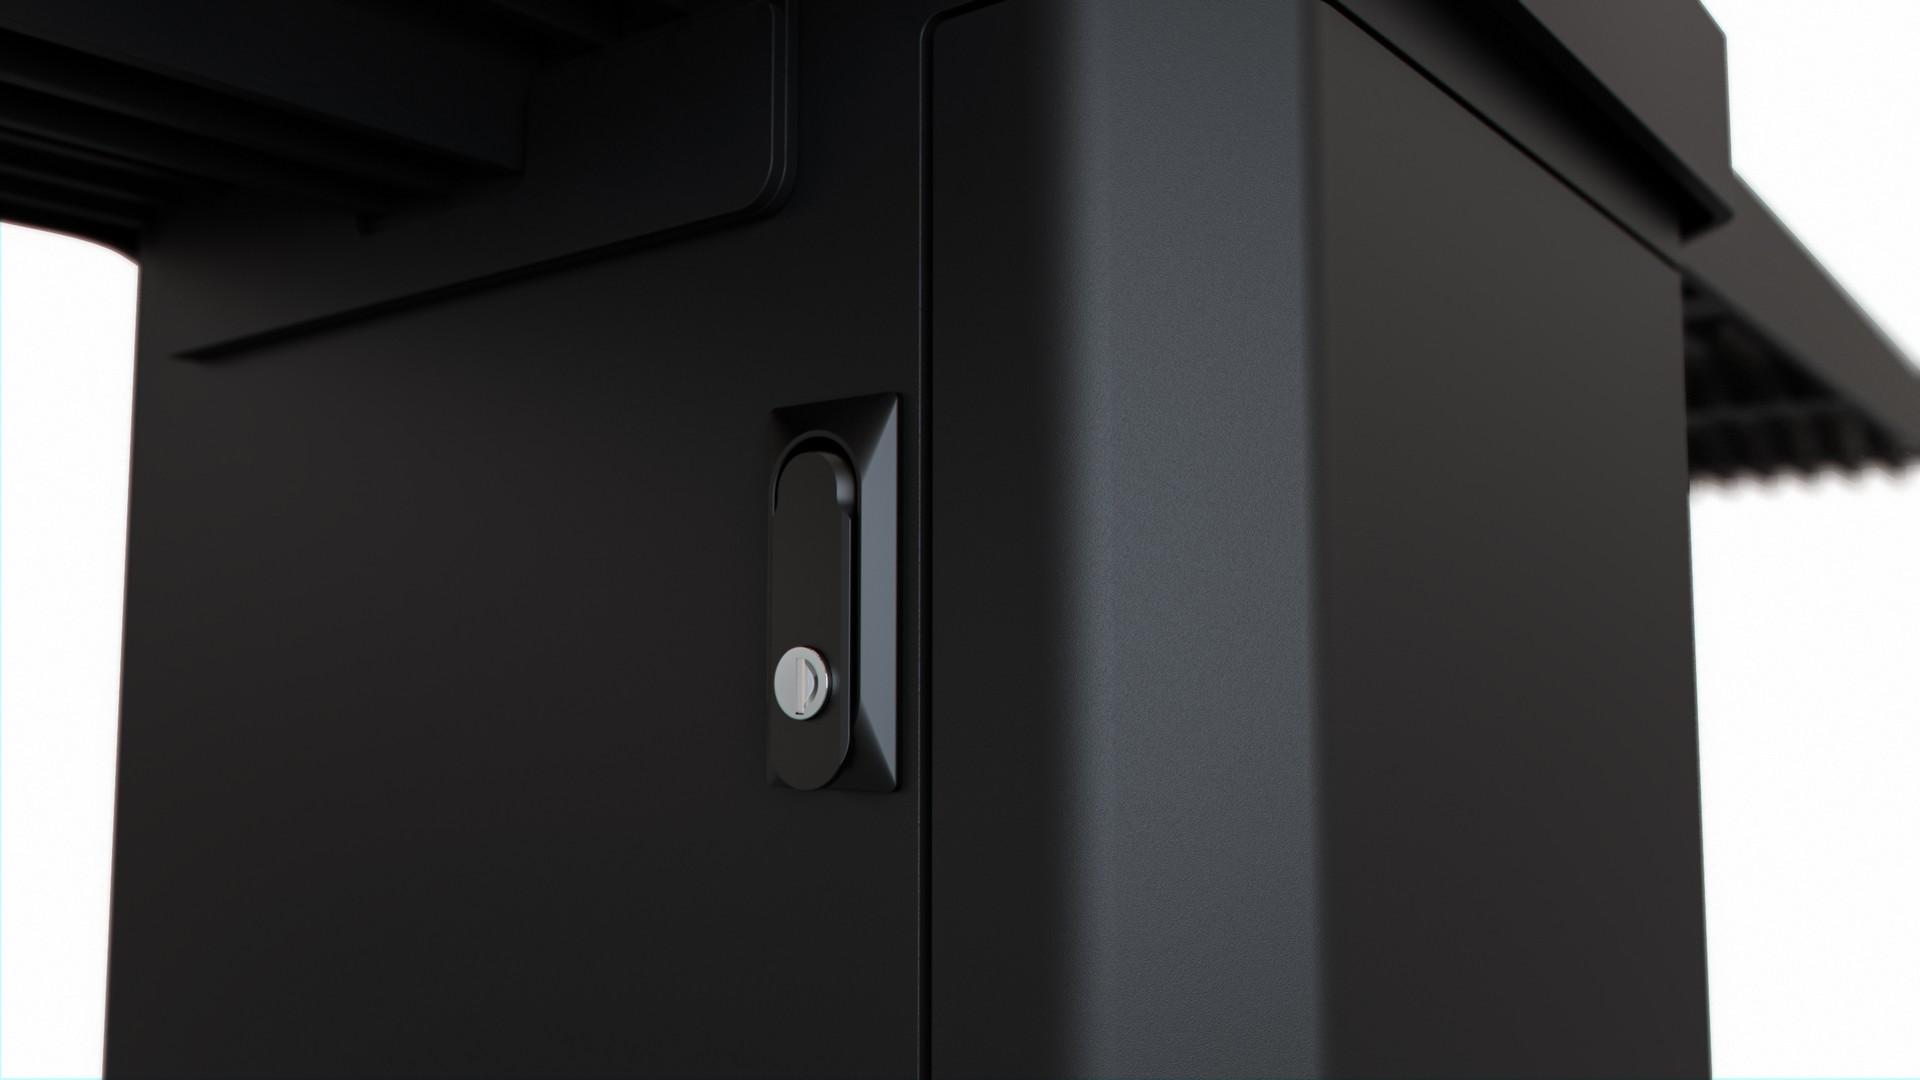 detail-01-rsz